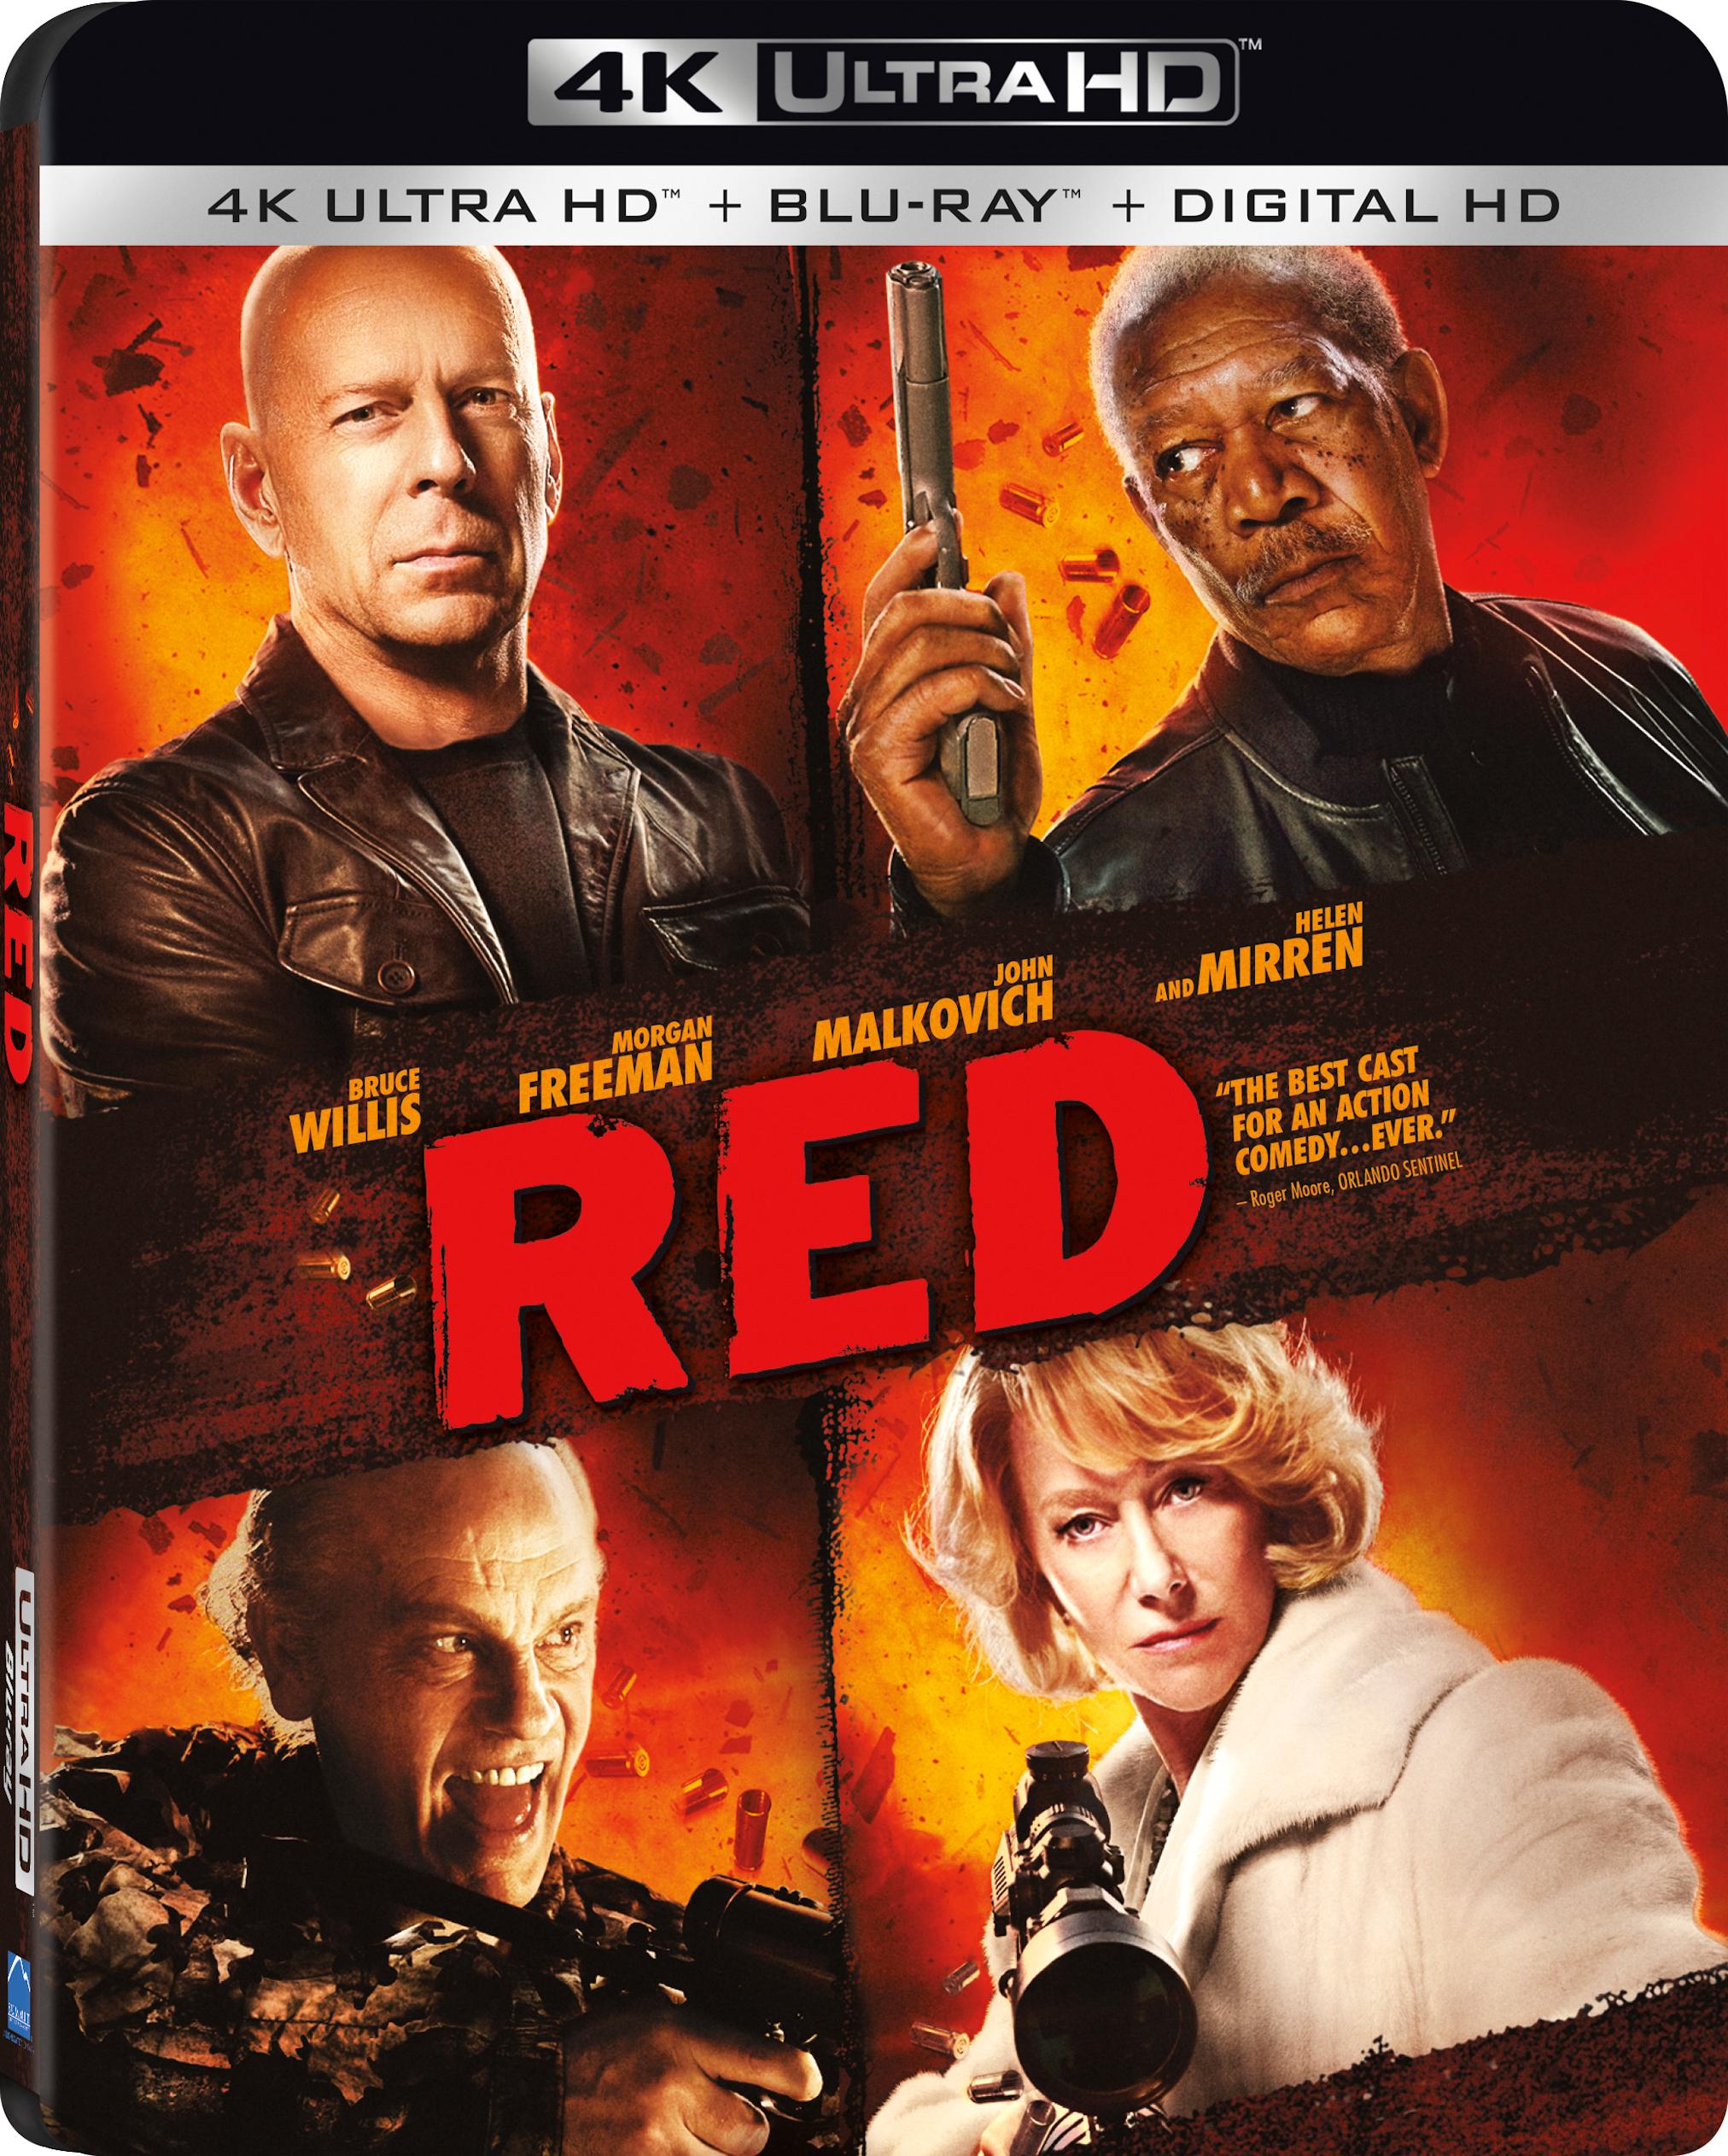 RED (2010) 4K Ultra HD Blu-ray